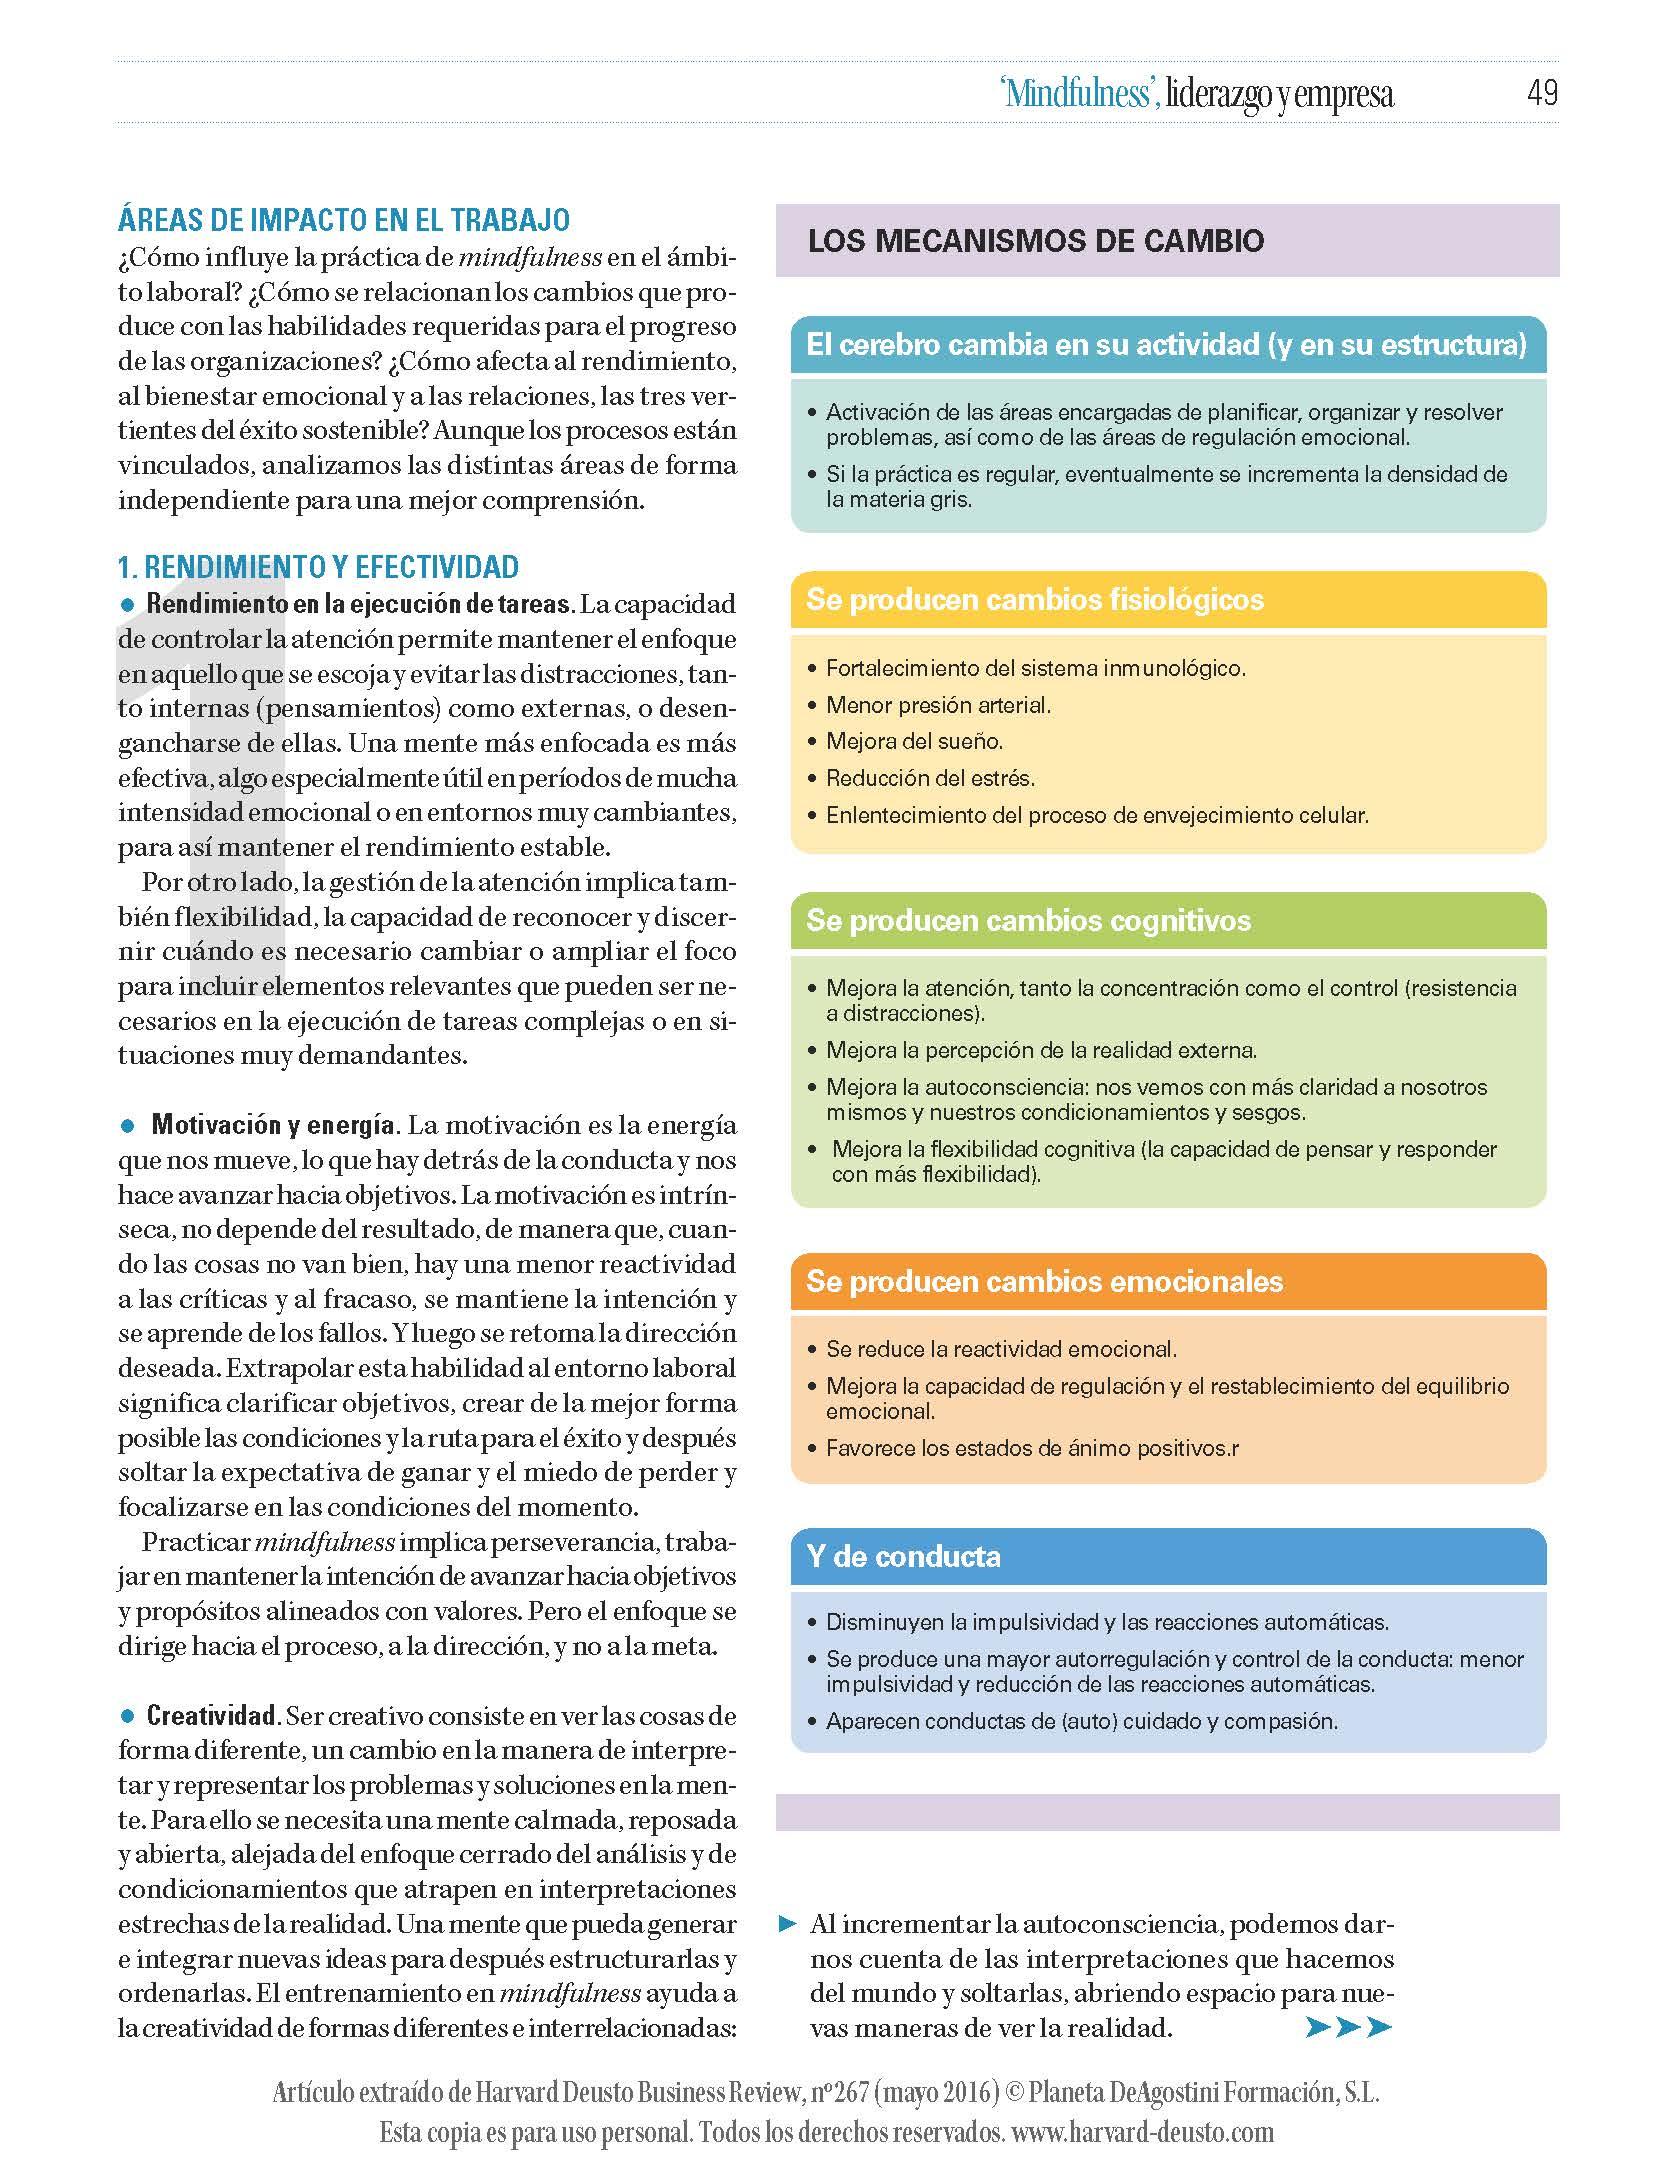 mindfulness y empresas. HBR. Estrella (2017)_Página_6.jpg